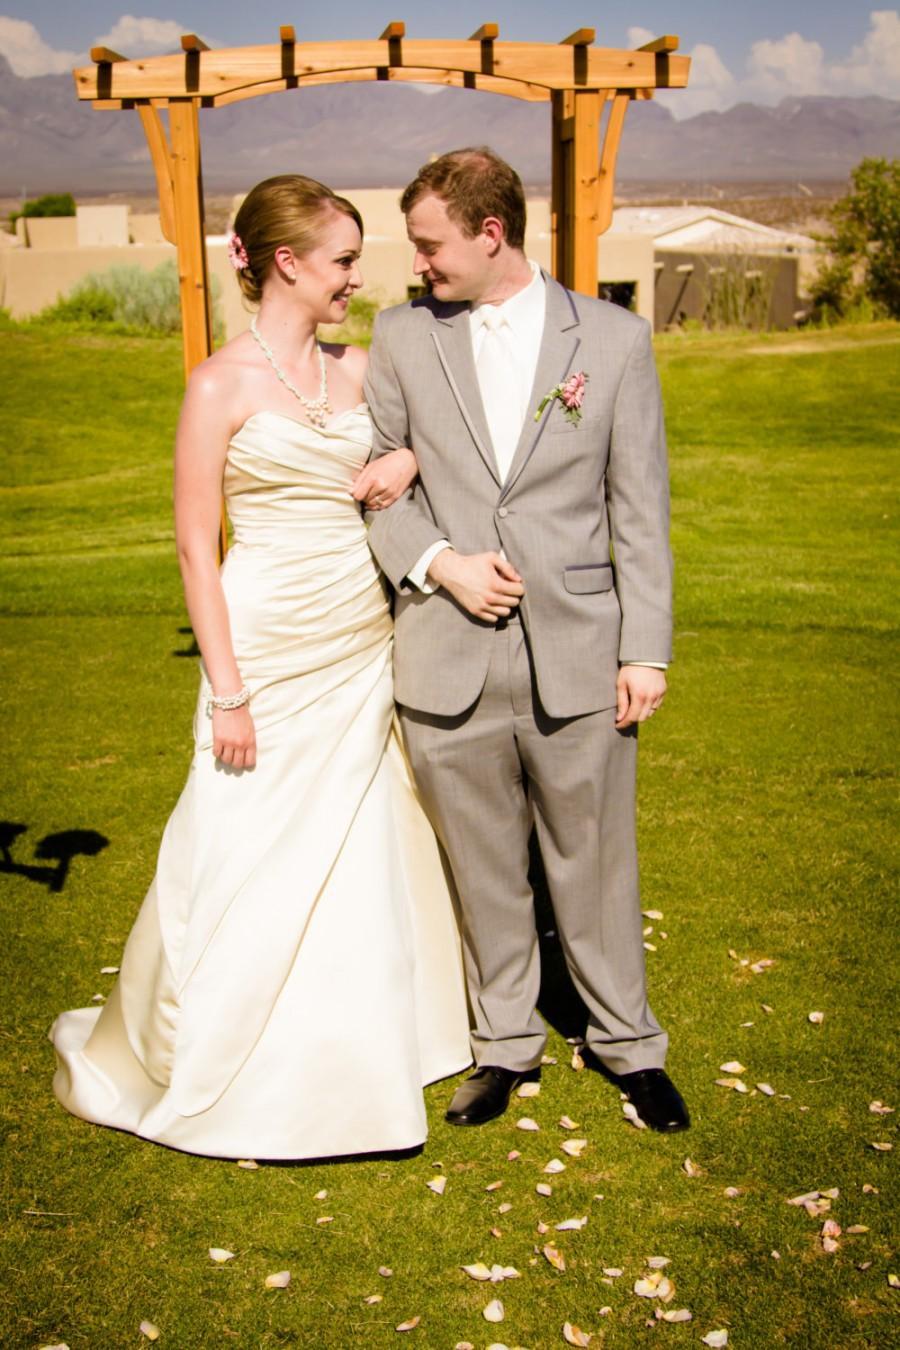 زفاف - Made in USA Custom Made Wedding Gown Asymmetrical White One Tigris Satin Rusched  Inspired with Sweetheart Neckline Misses Plus Size